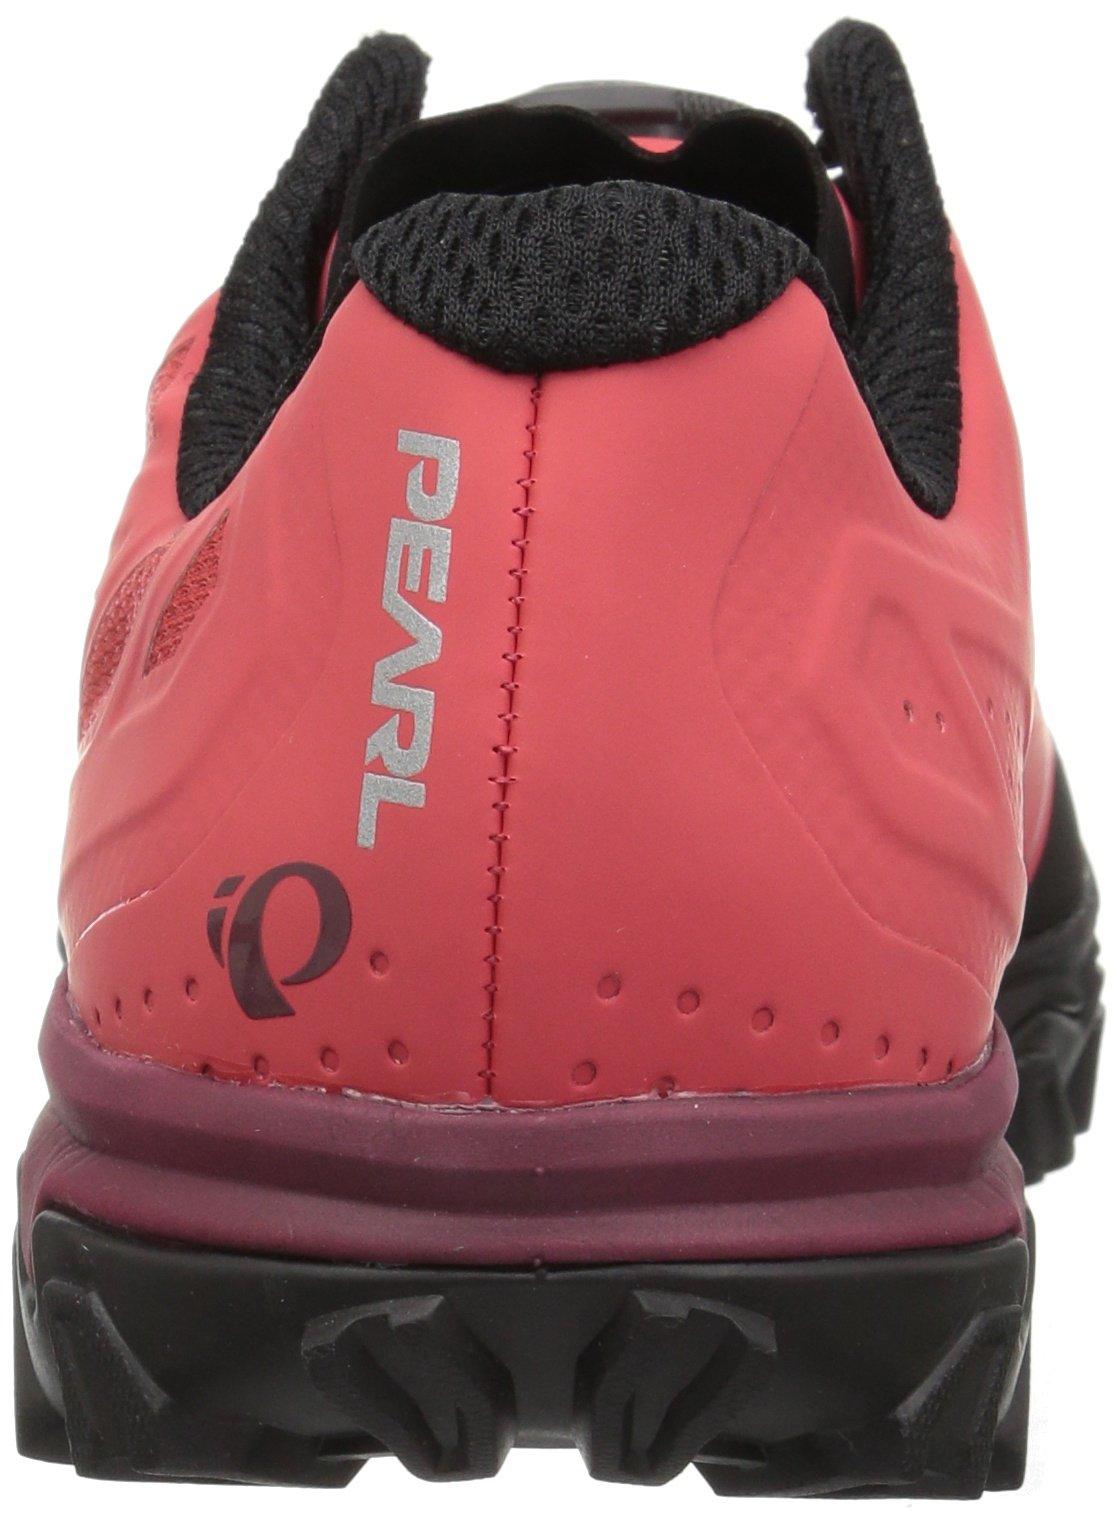 Pearl iZUMi Women's W X ALP Elevate Cycling Shoe